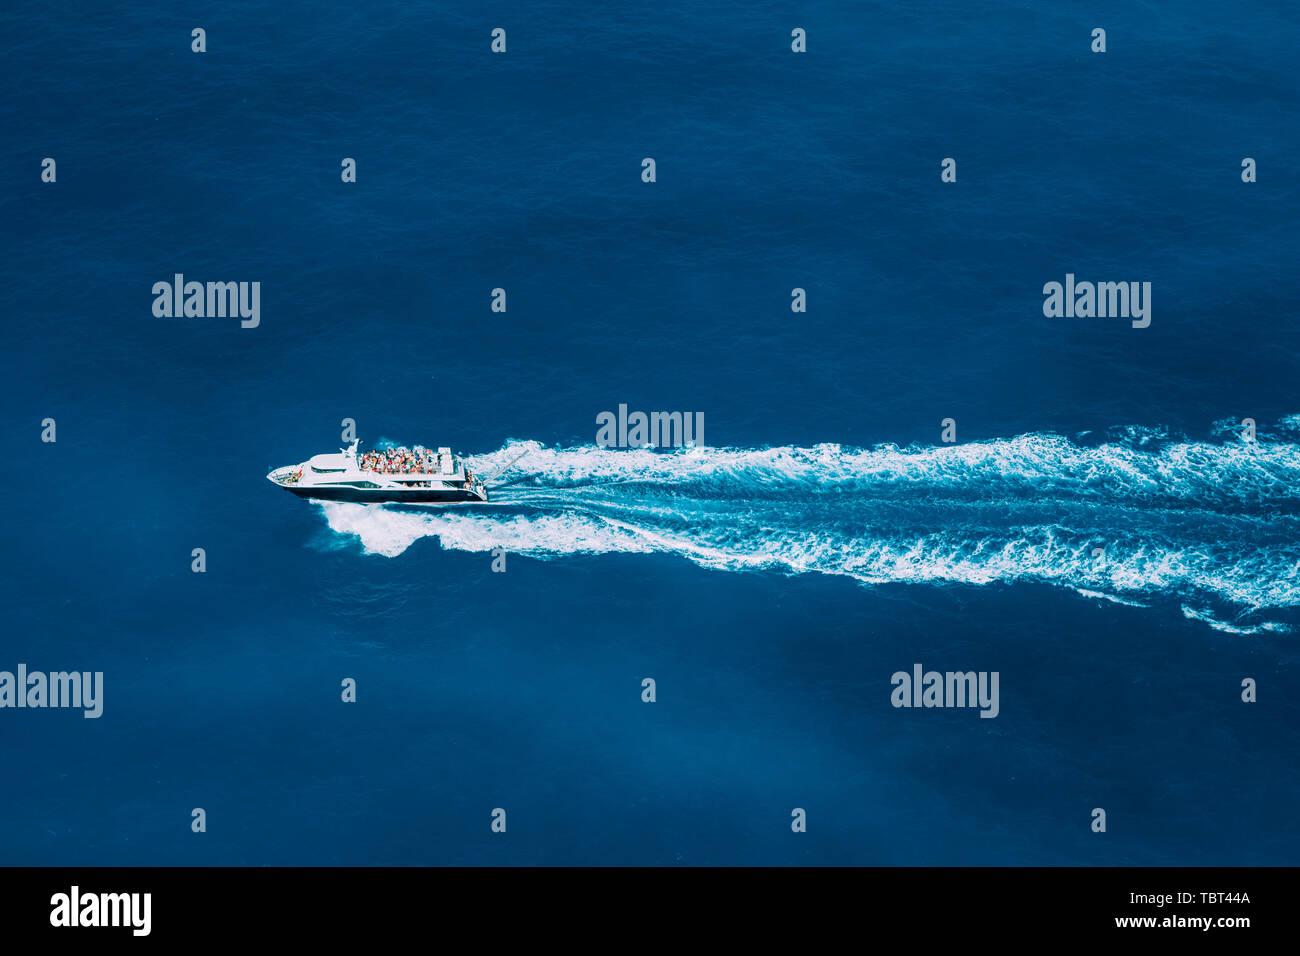 Tourist boat in full speed in open sea, Greece Stock Photo